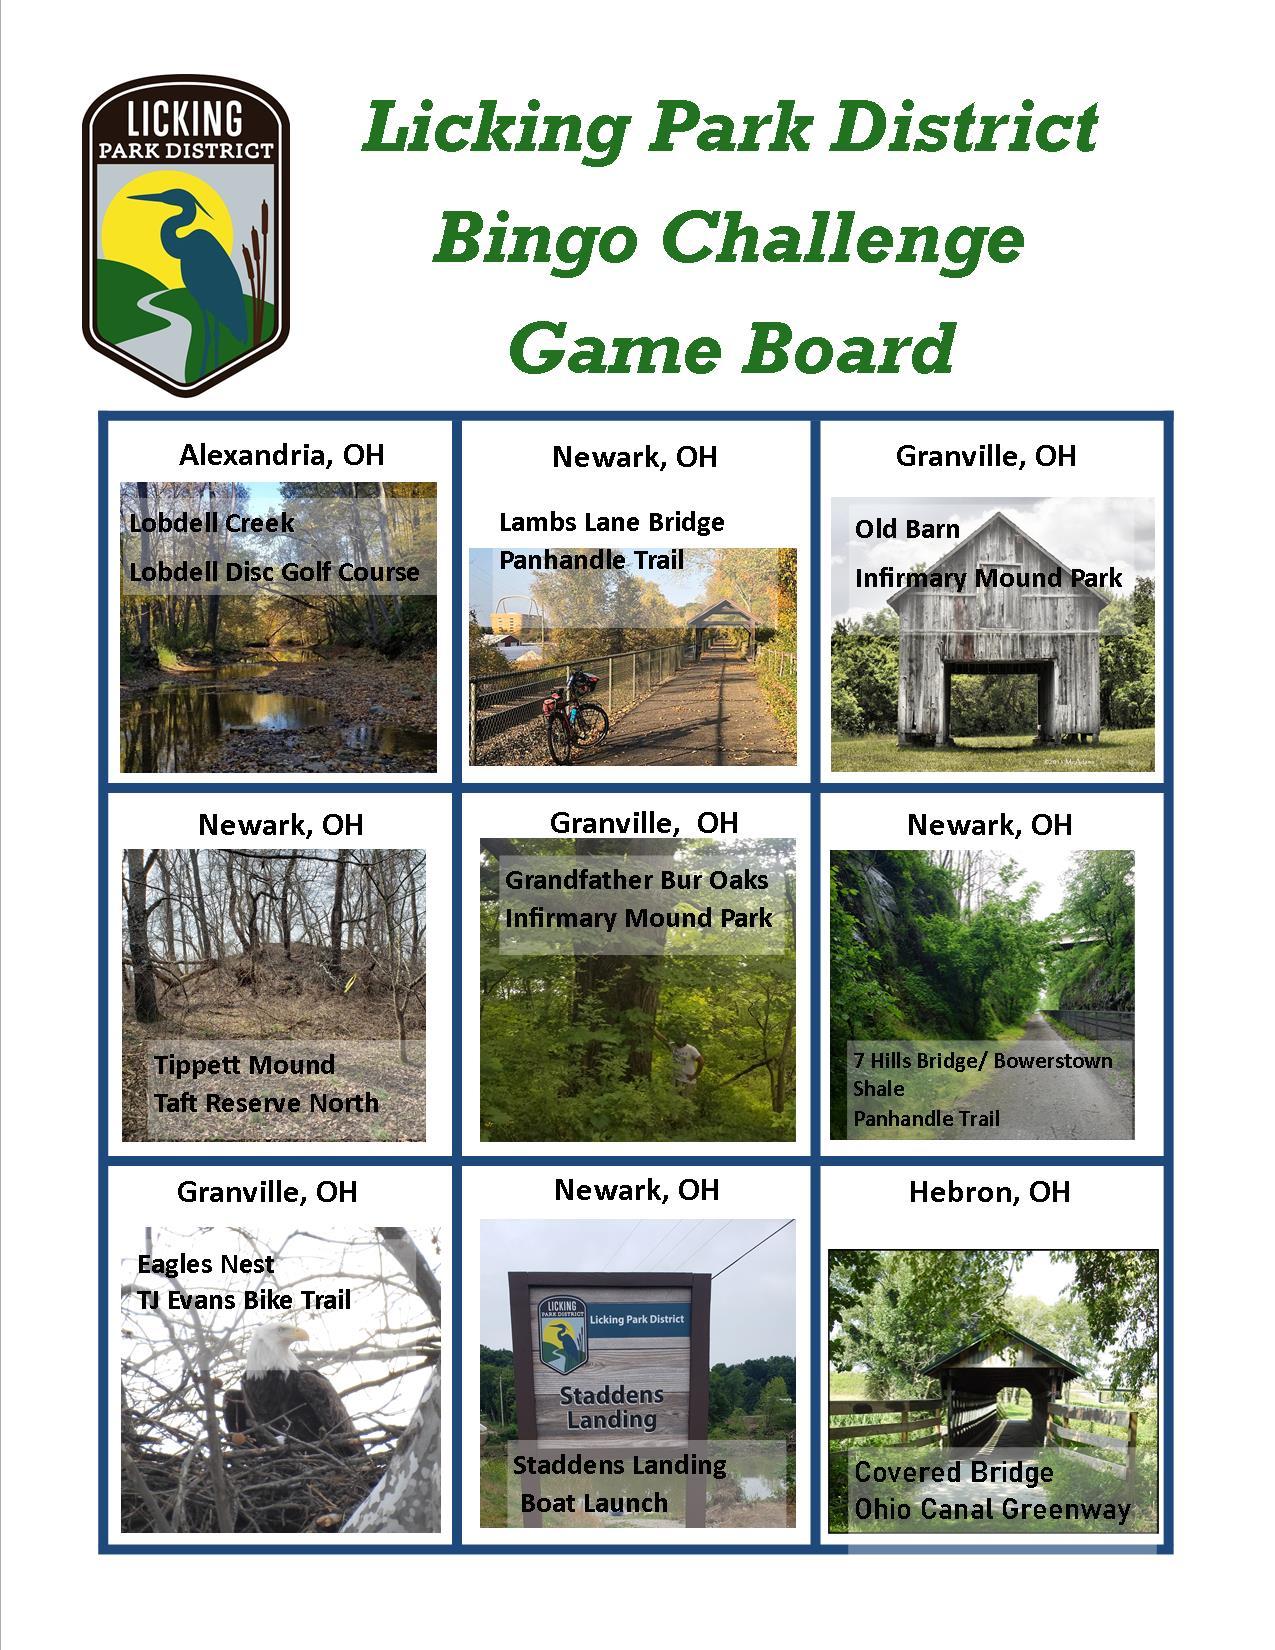 Bingo Challenge game board